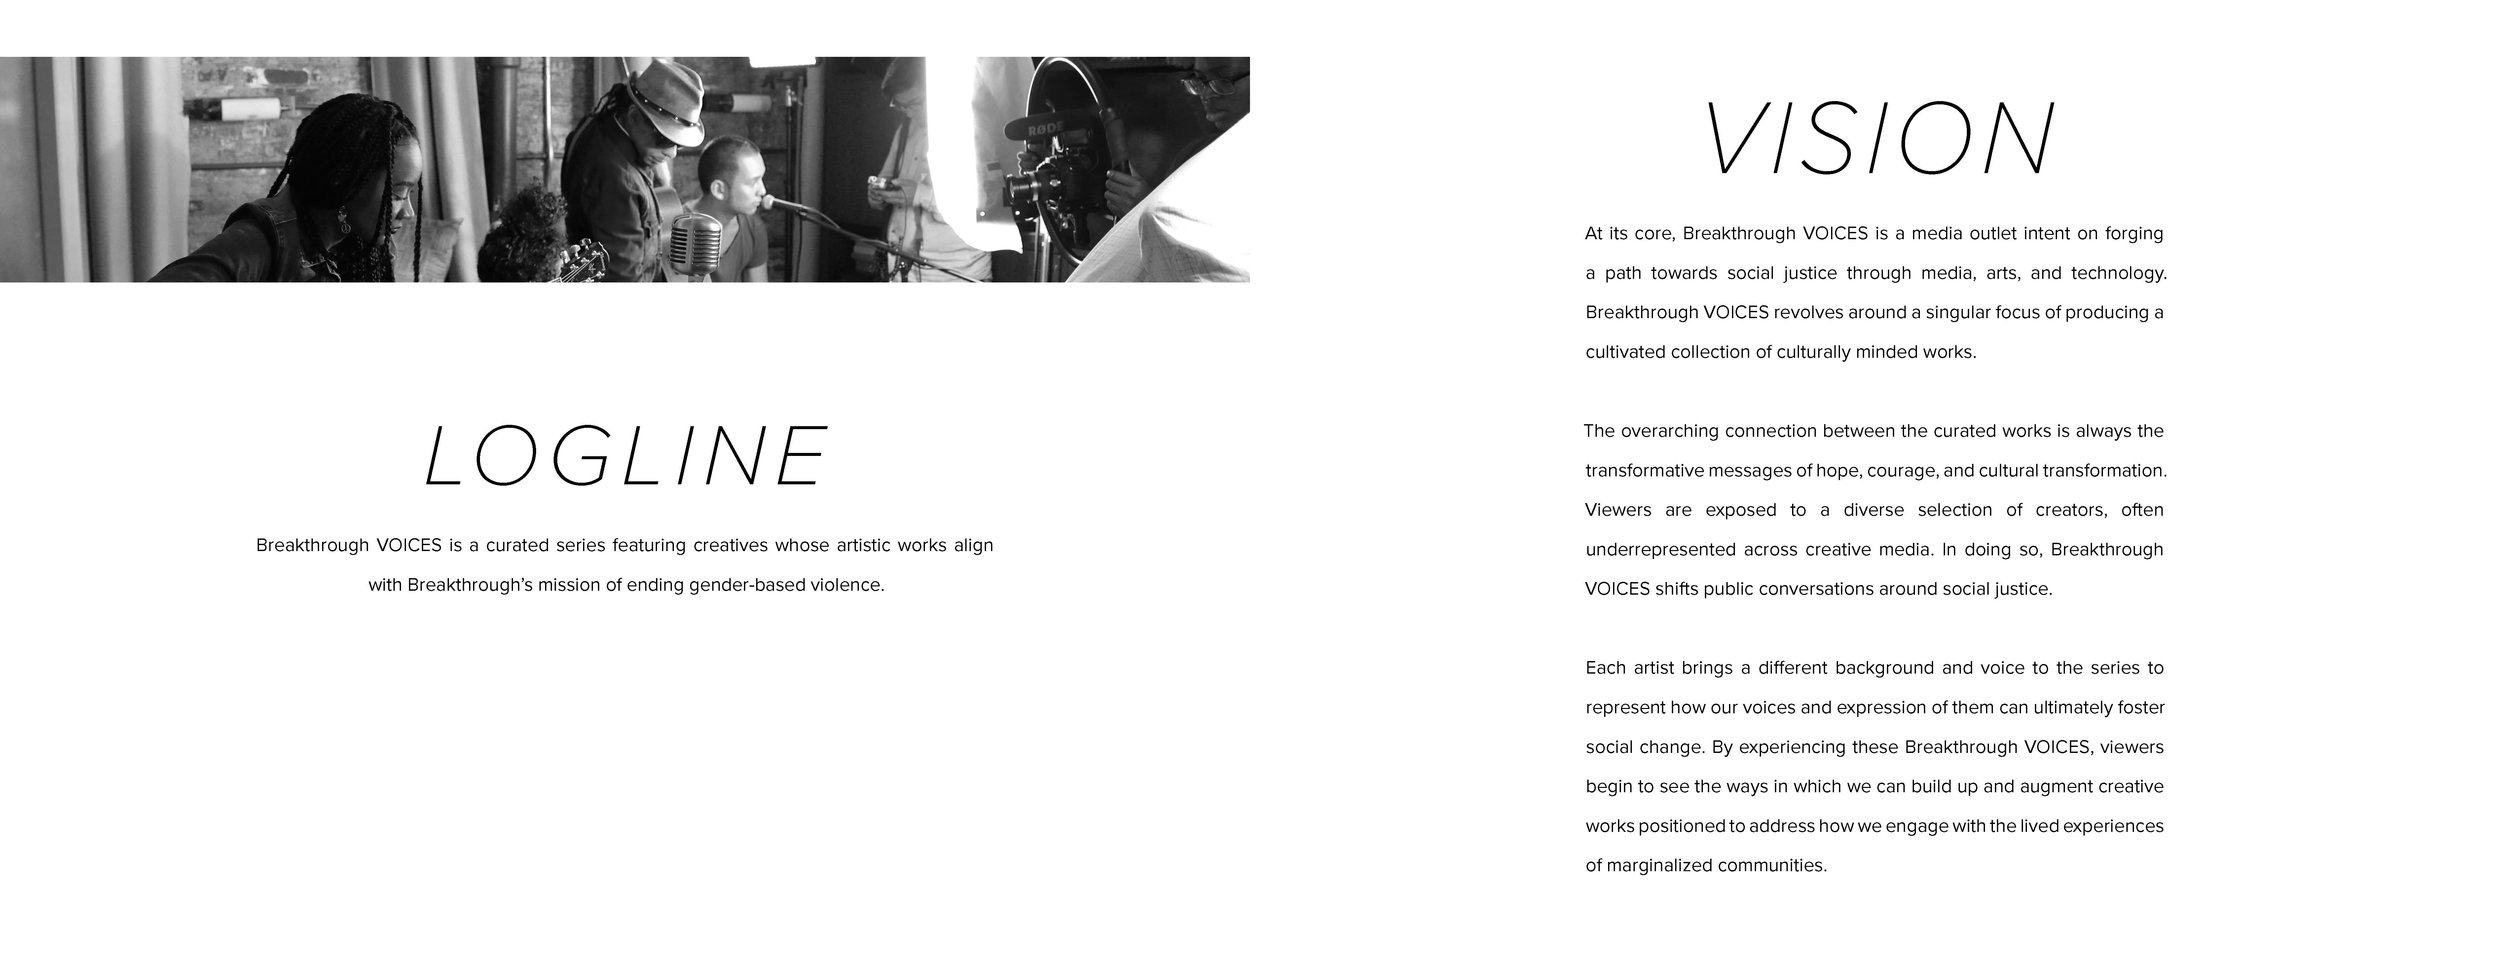 BTV 2019 Press Kit S2 V2_Page_04.jpg